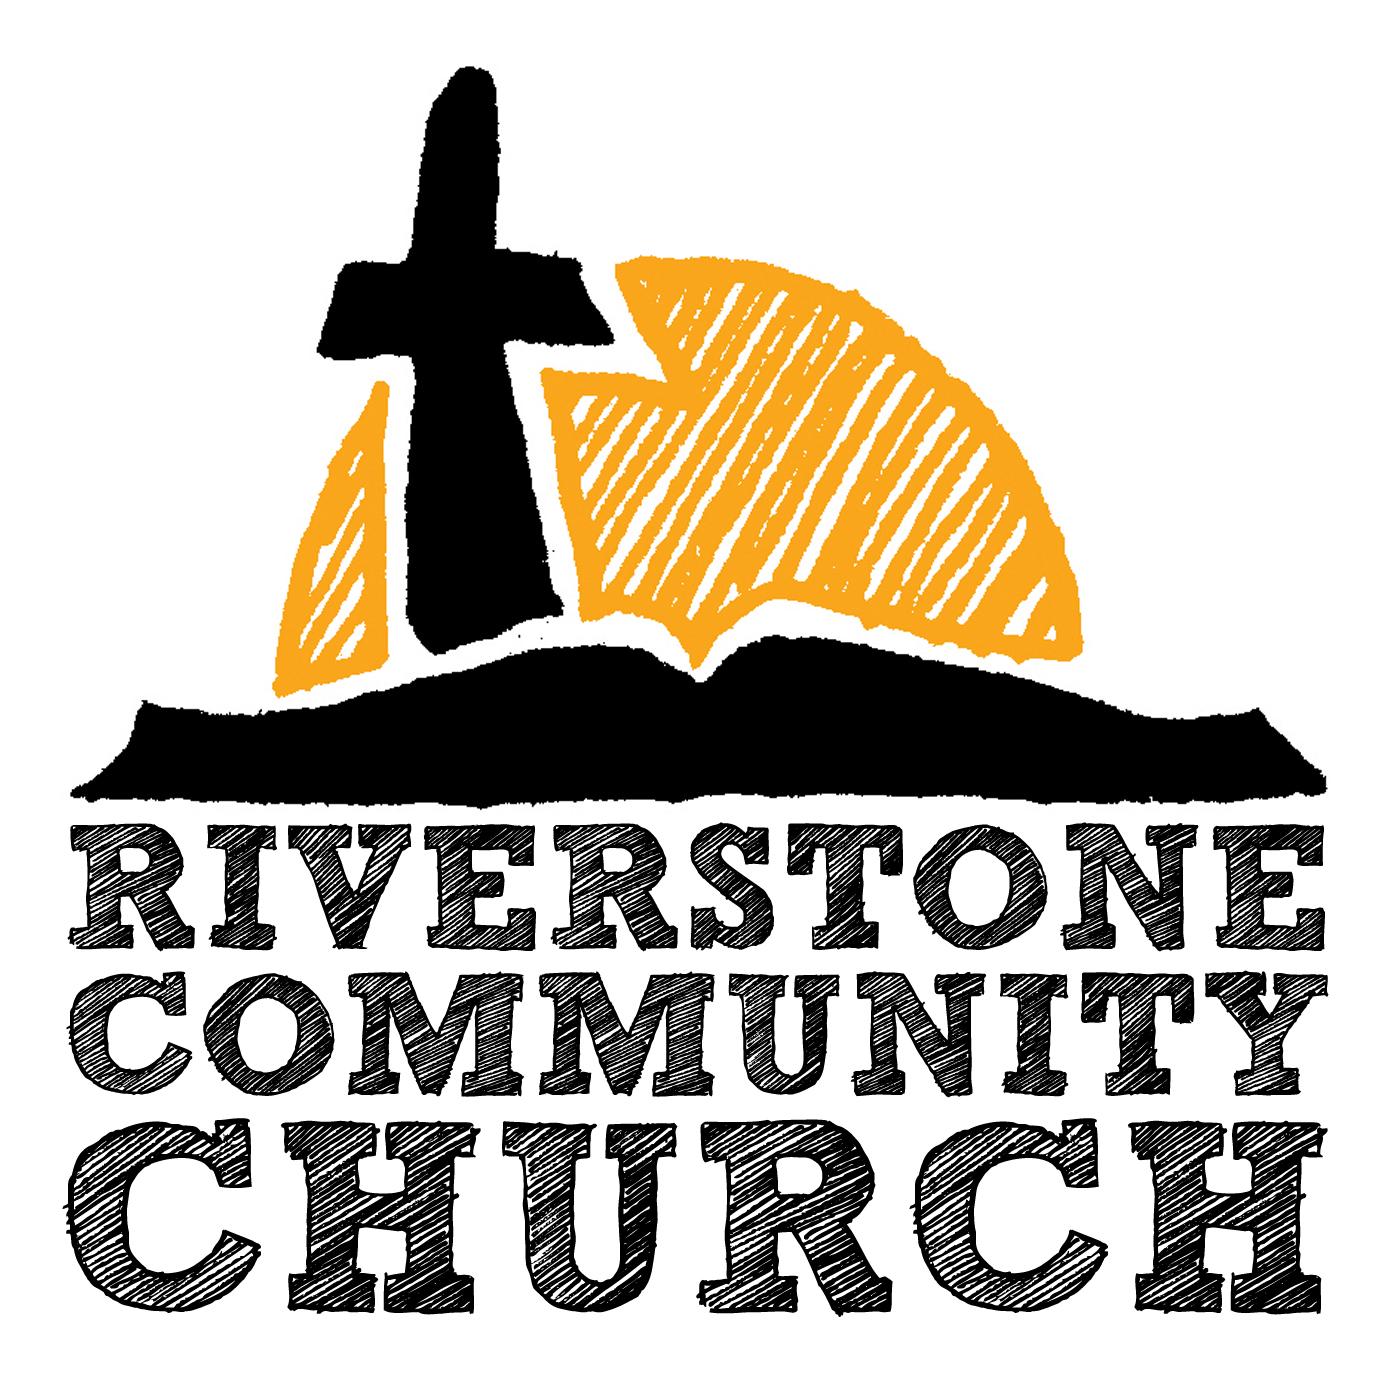 Riverstone Community Church - MP3 Audio Podcast